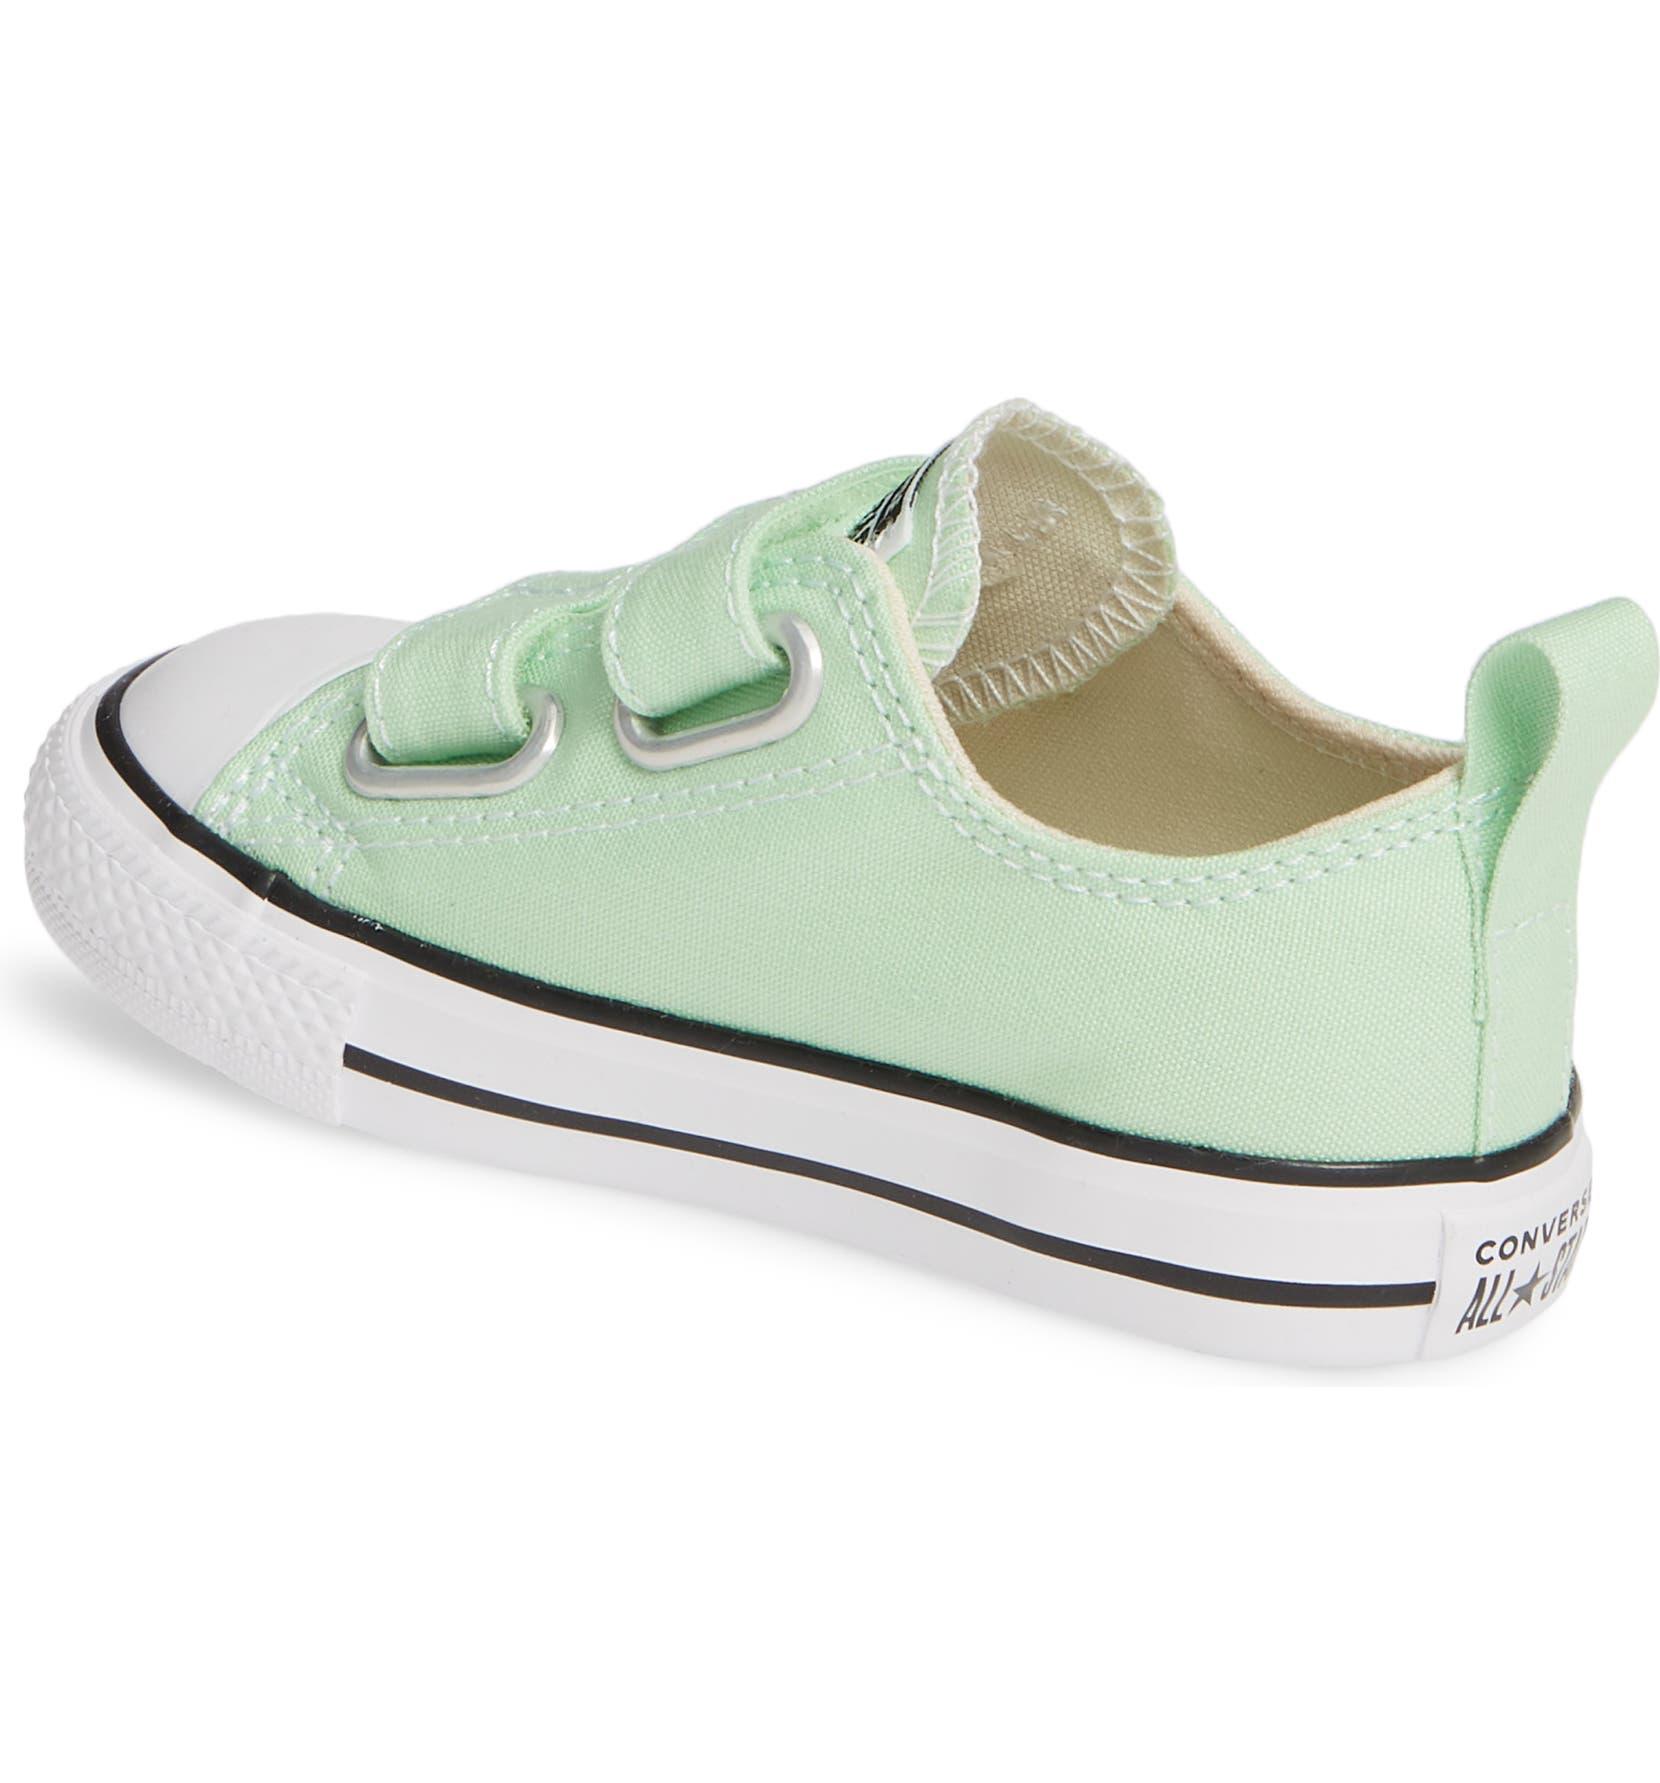 16cc20e5b1f7 Converse Chuck Taylor®  Double Strap  Sneaker (Baby